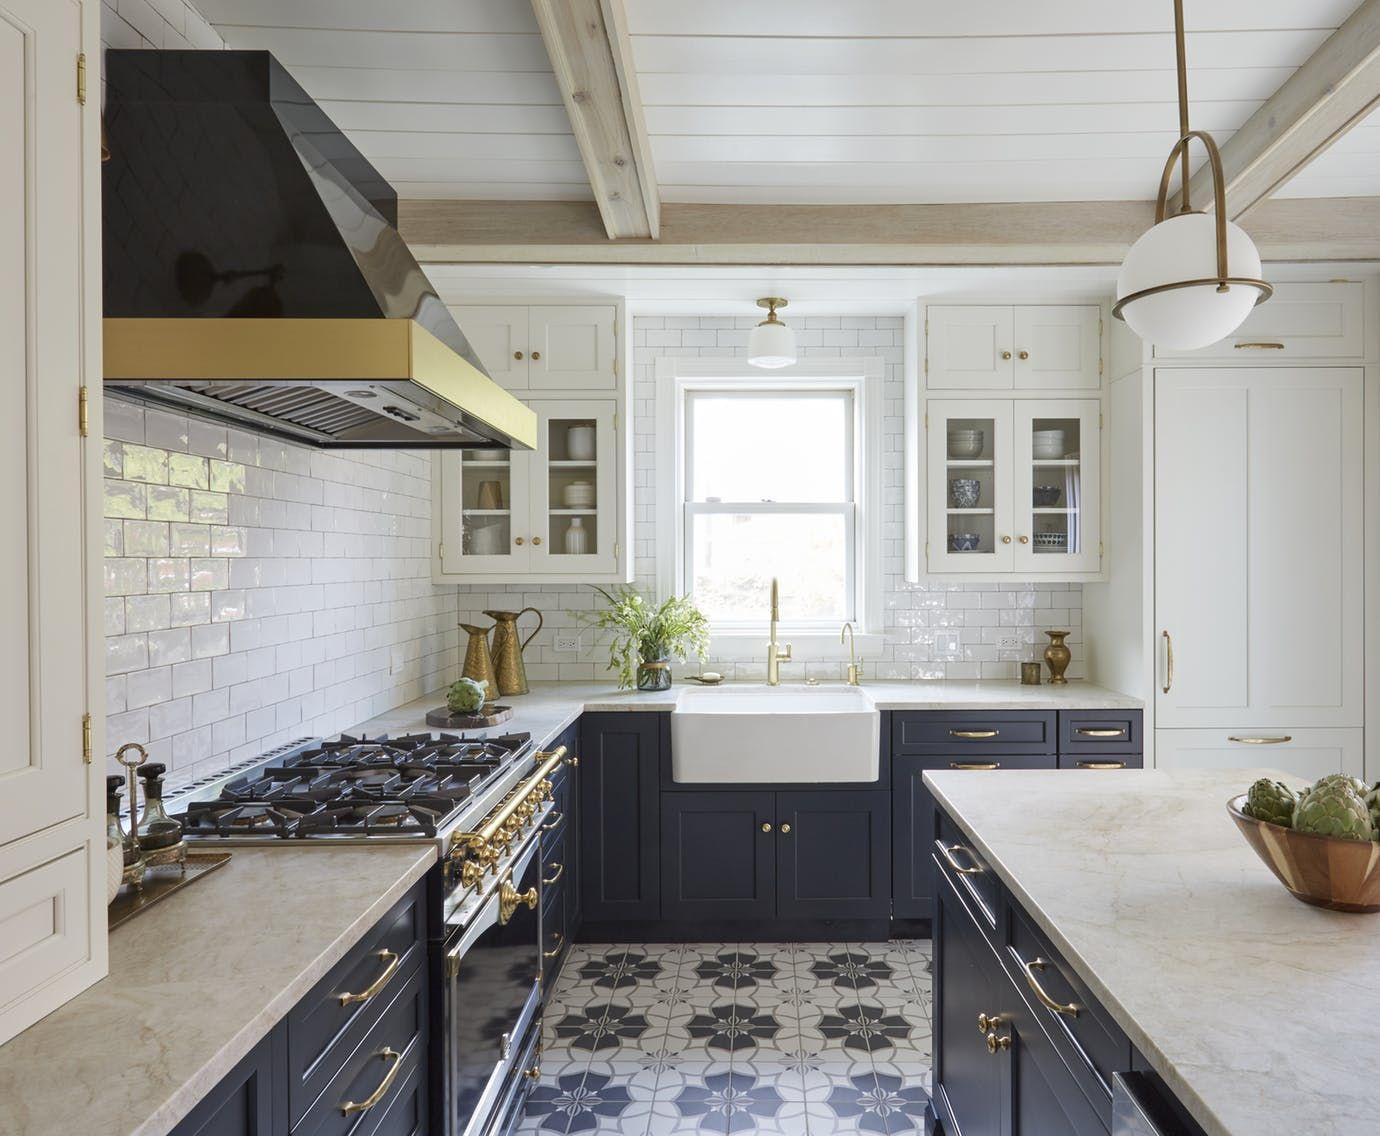 Julian Chicago Residence Kitchen MidCenturyModern Eclectic ...